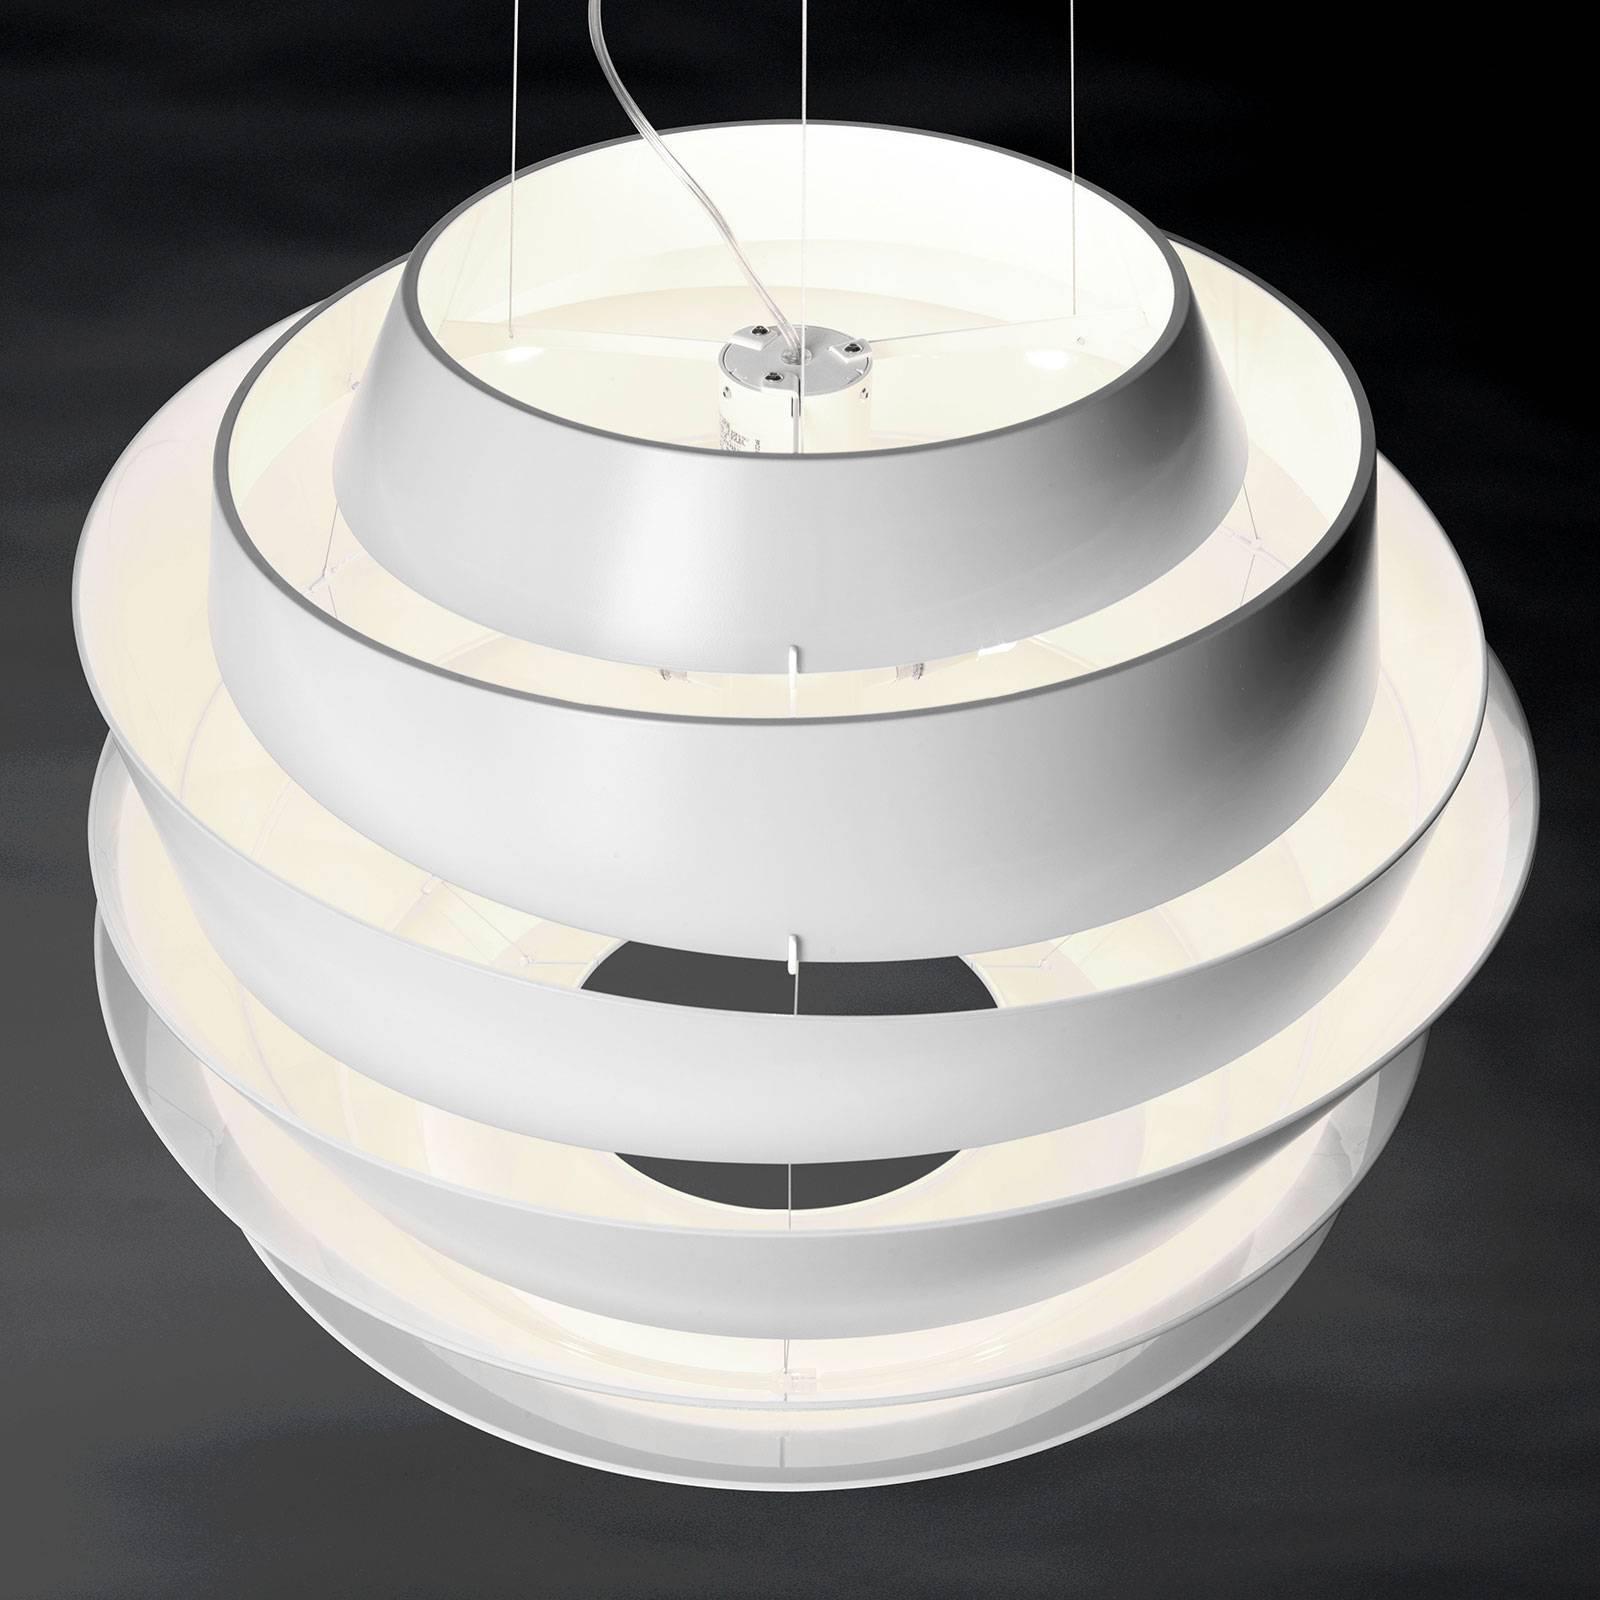 Foscarini Le Soleil LED-Hängeleuchte weiß, dimmbar